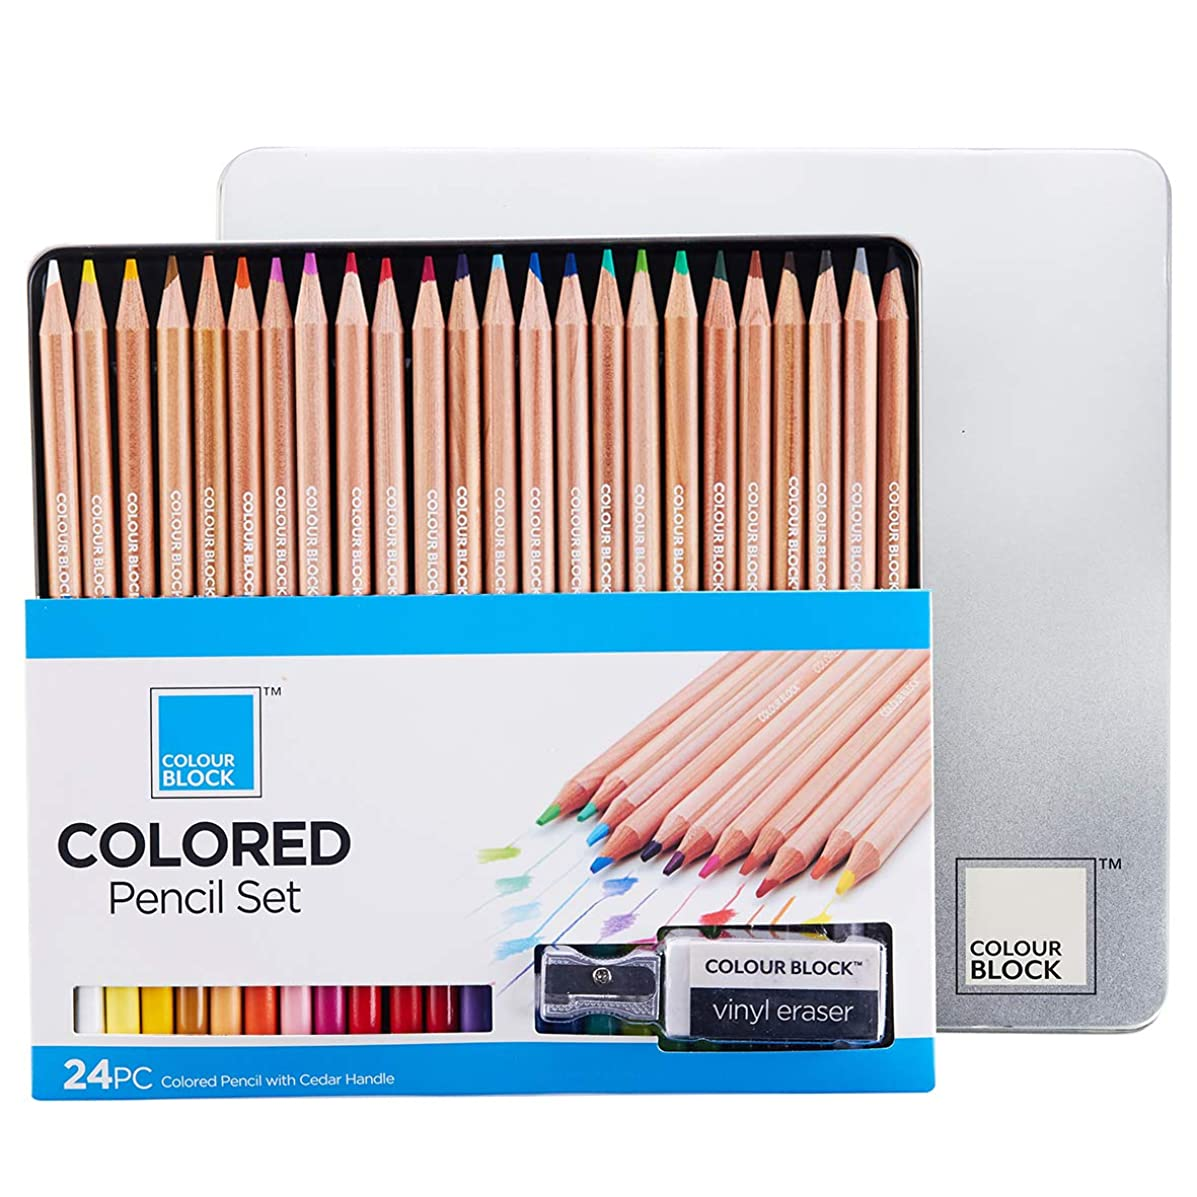 COLOUR BLOCK 24 Colored Pencils with Cedar Handles, Set Comes in a Tin Storage Box with Bonus Vinyl Eraser and Sharpener